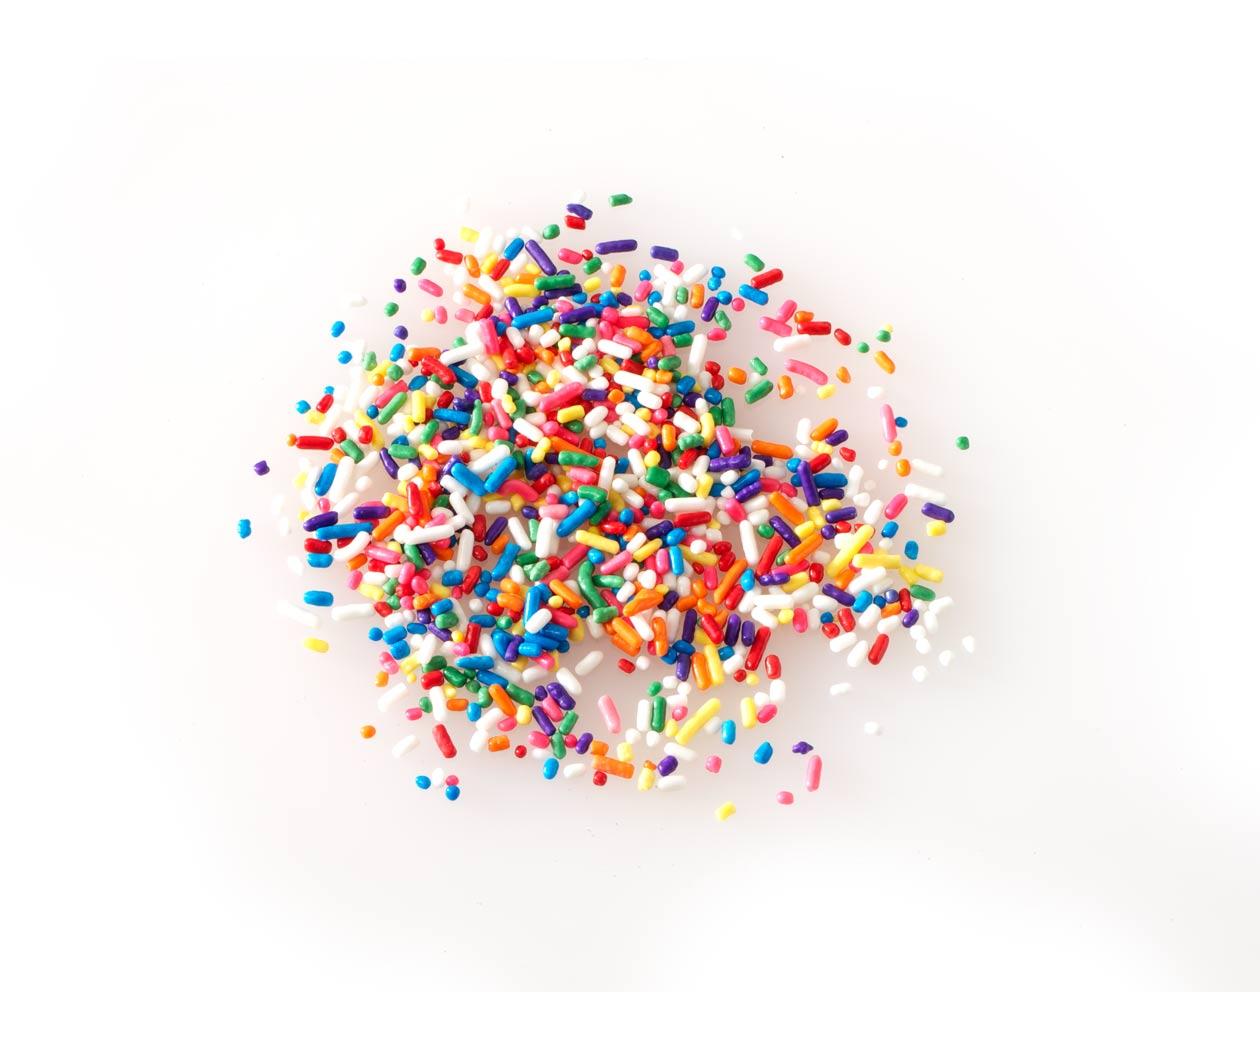 Sprinkles Clipart.